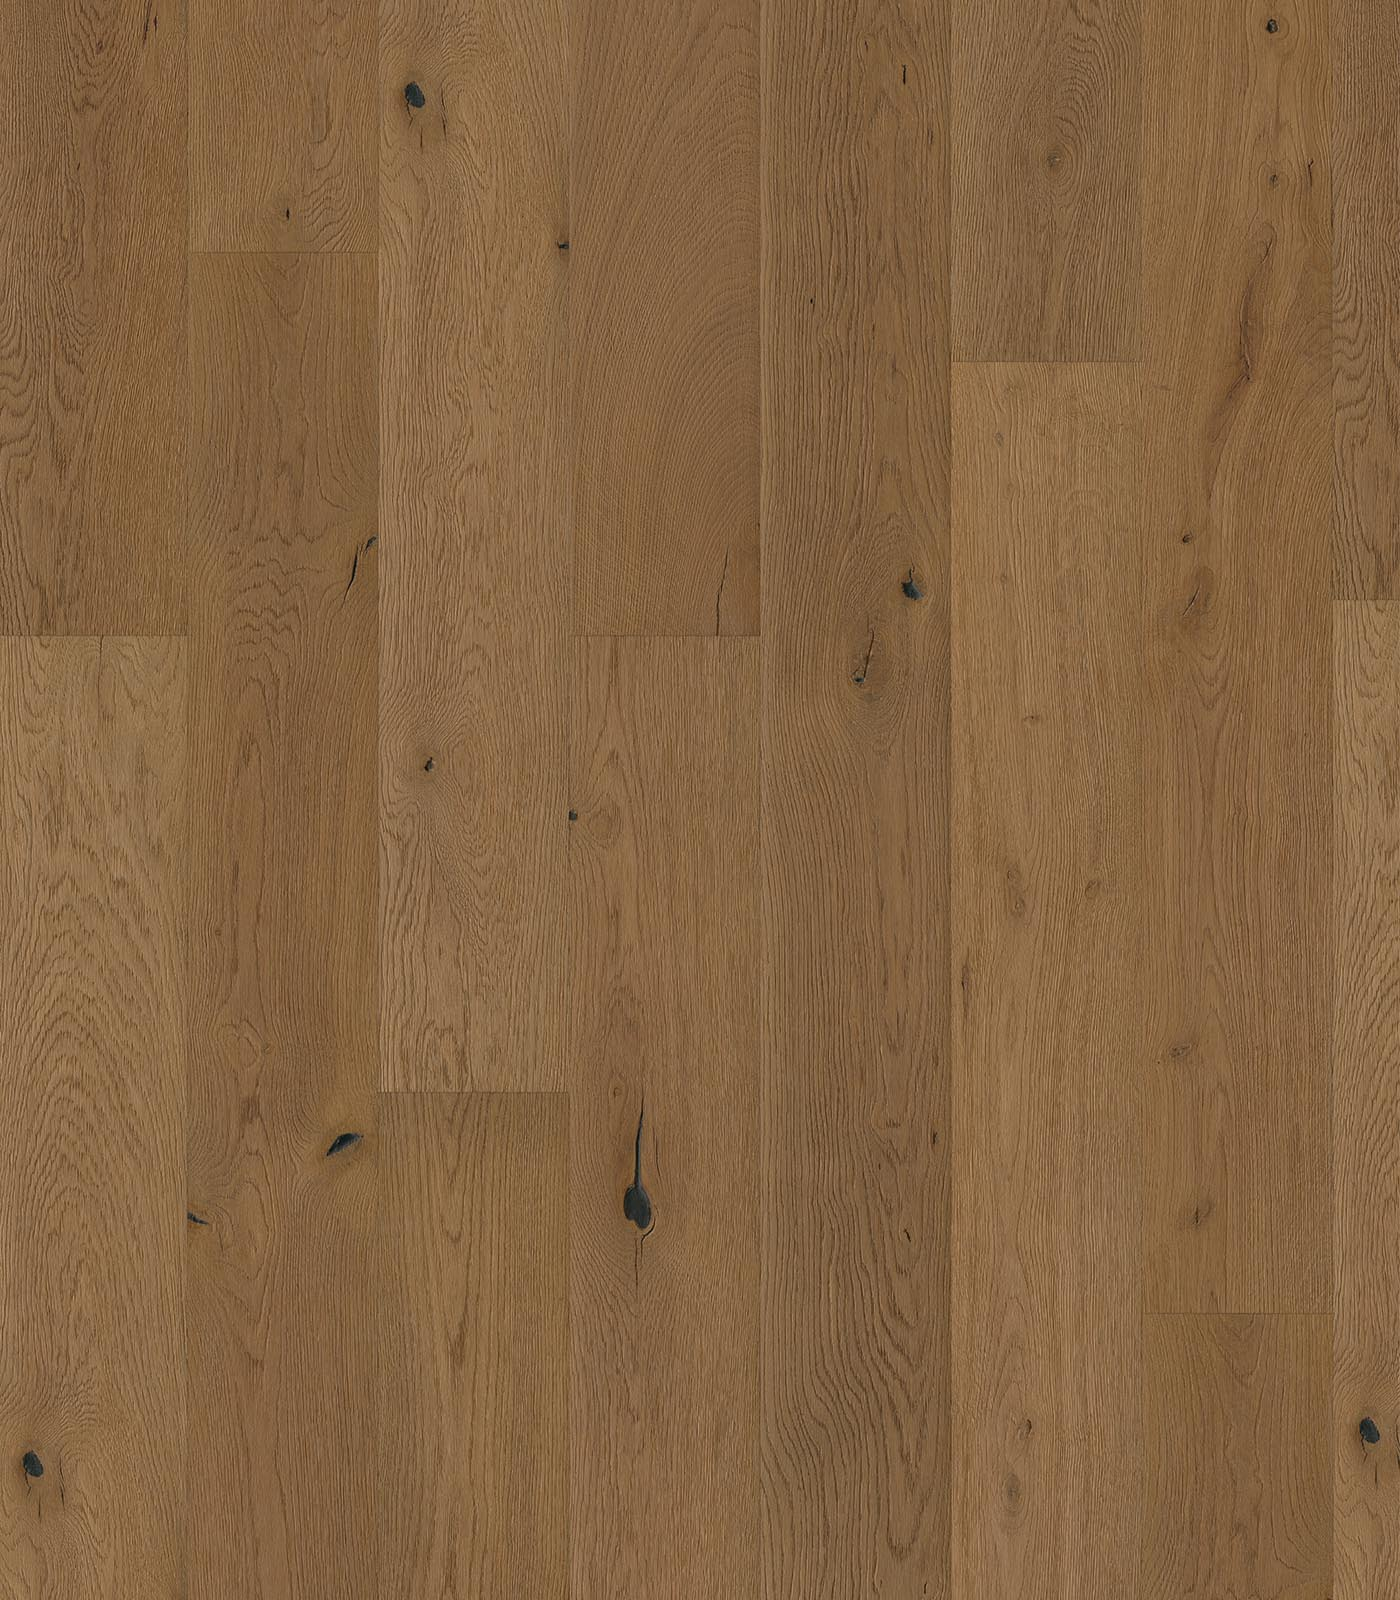 Modena-Heritage Collection-European oak flooring-flat